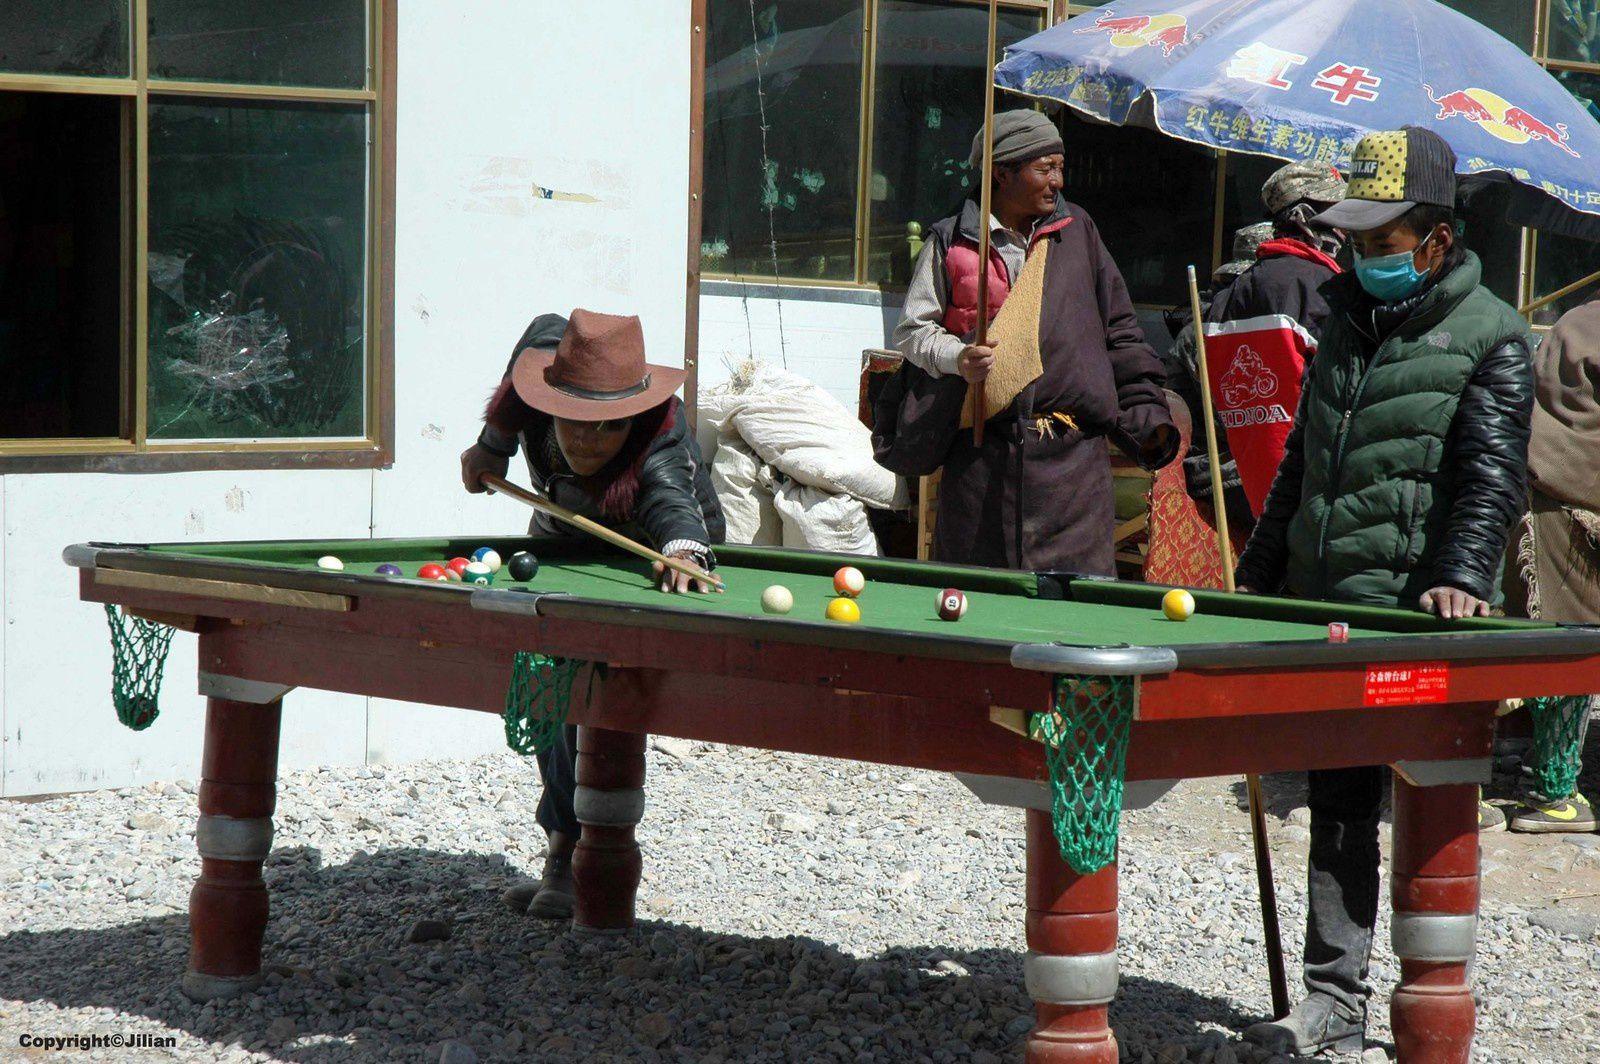 Tibet (5) : Nomades et villageois - 西藏 (5) :游牧民和村民